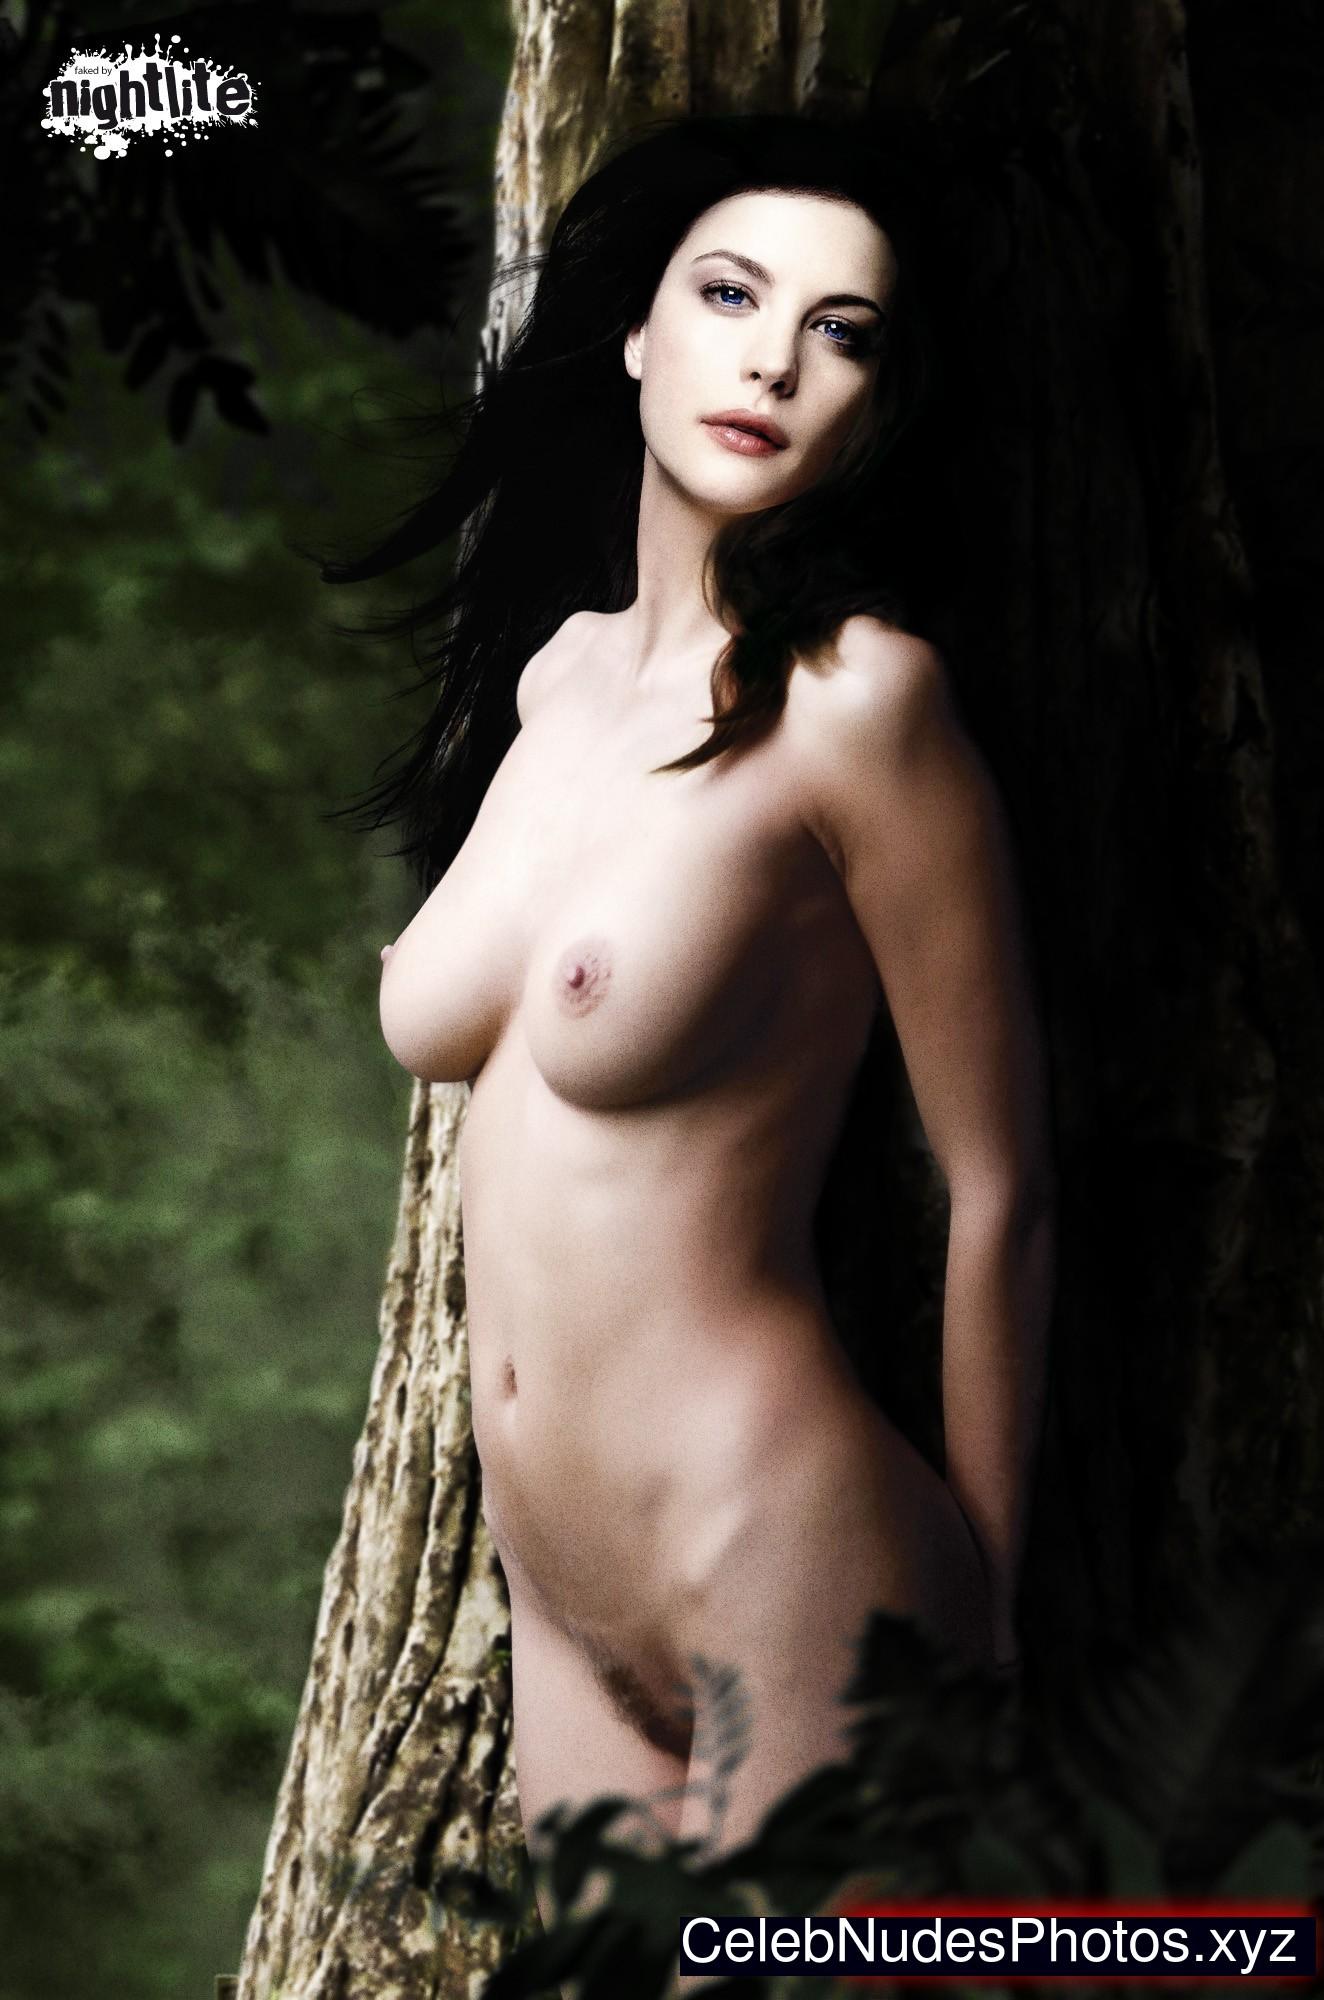 harley quinn nude hentai